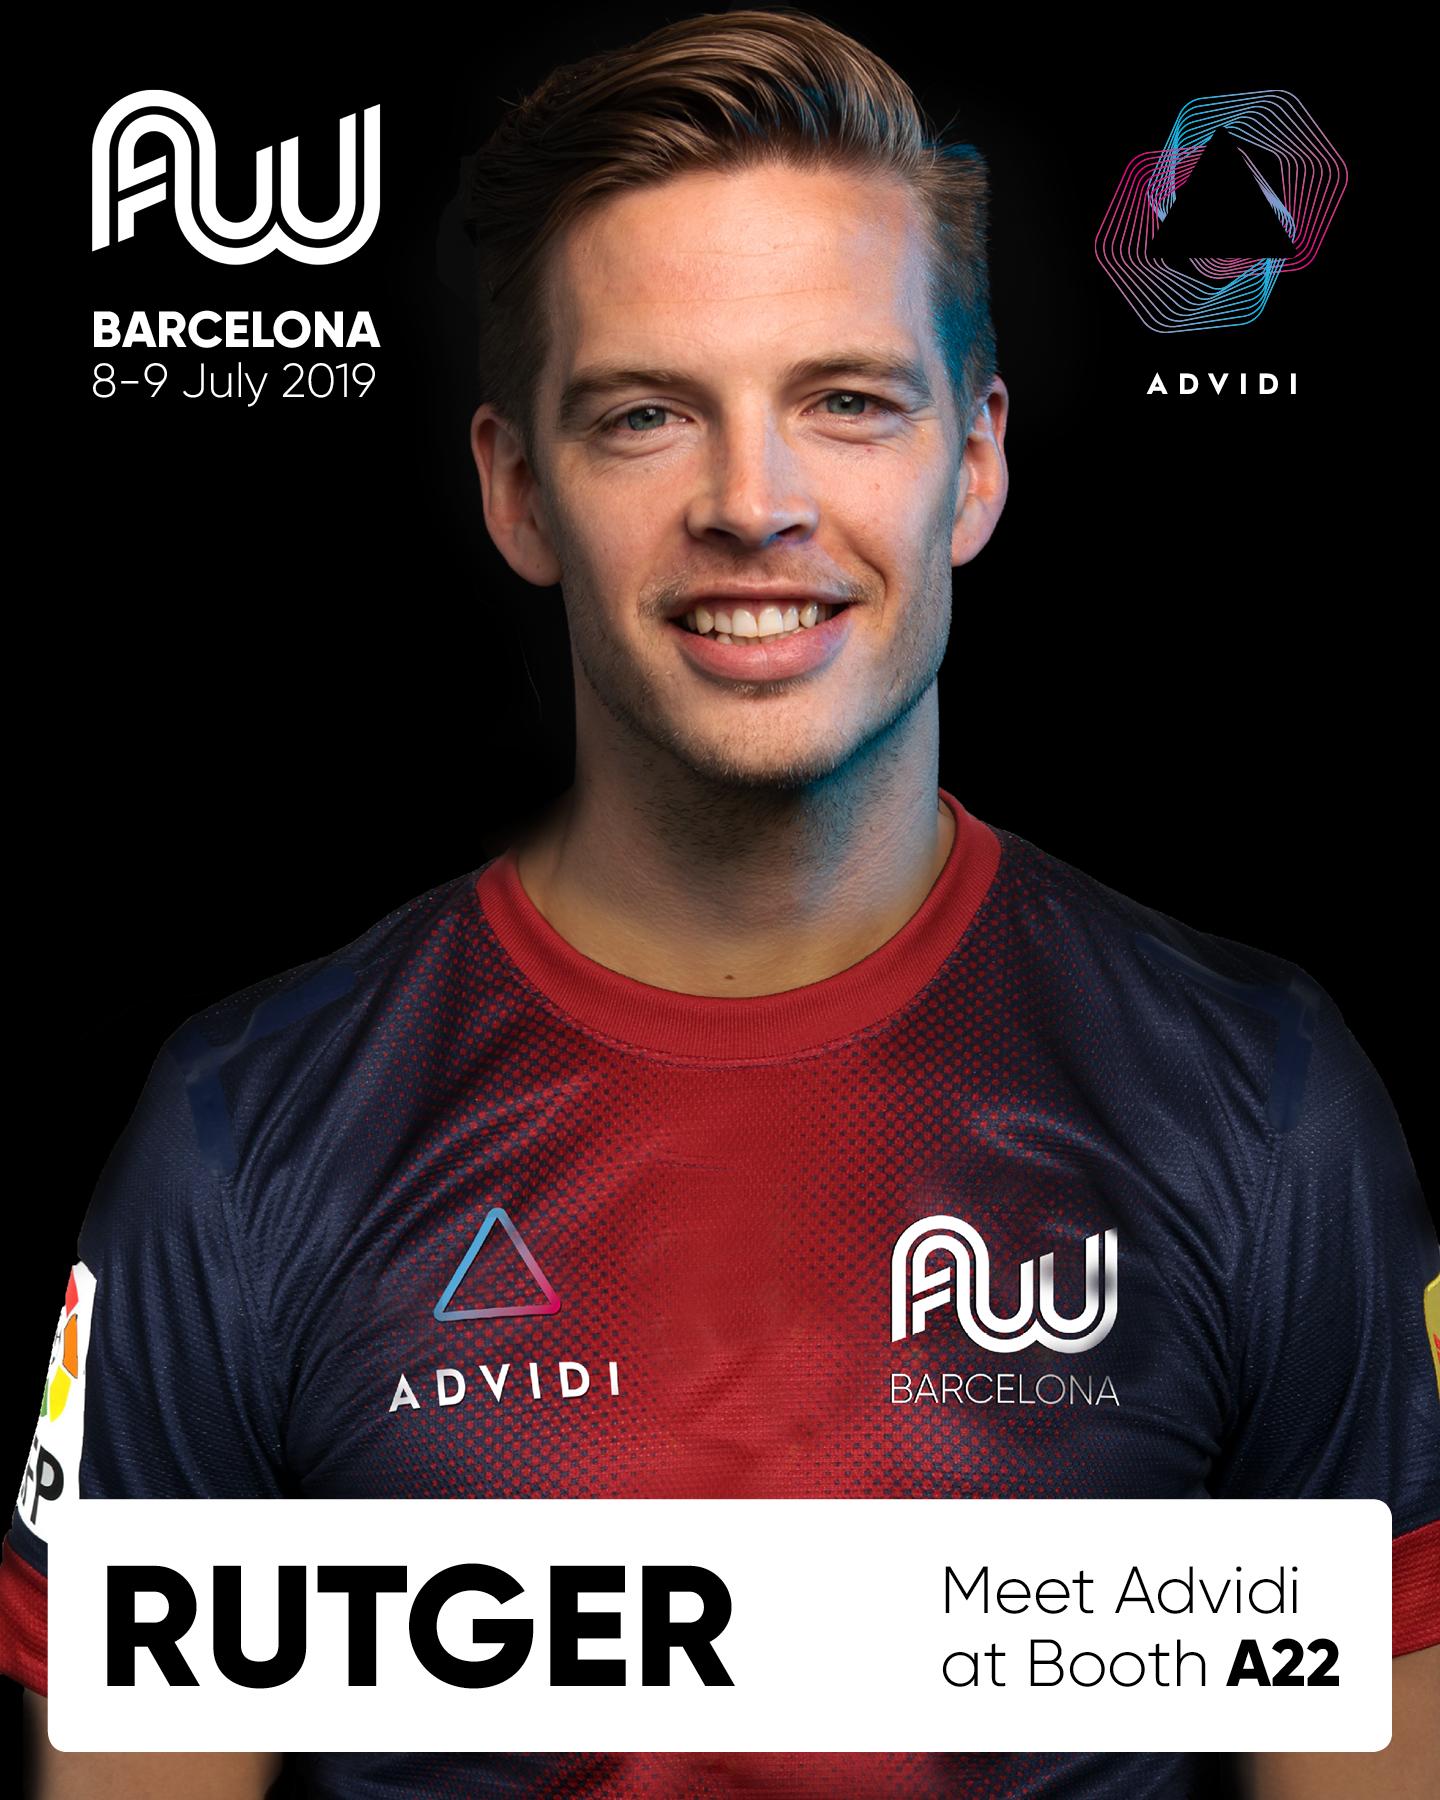 Rutger Advidi